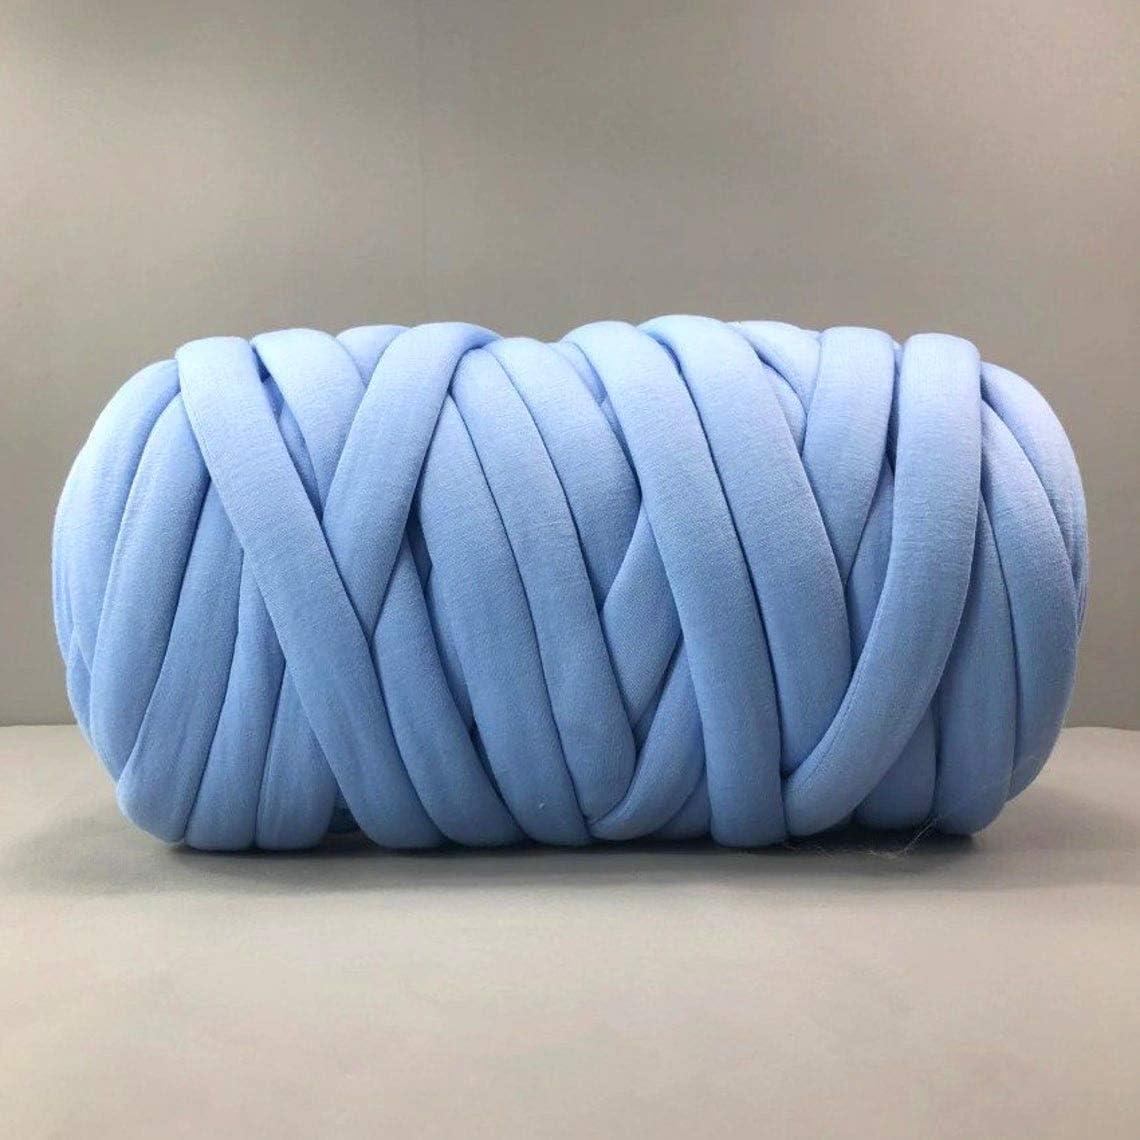 clootess Arm Knitting Yarn Chunky Handmade Cotton Braid depot for Popular standard